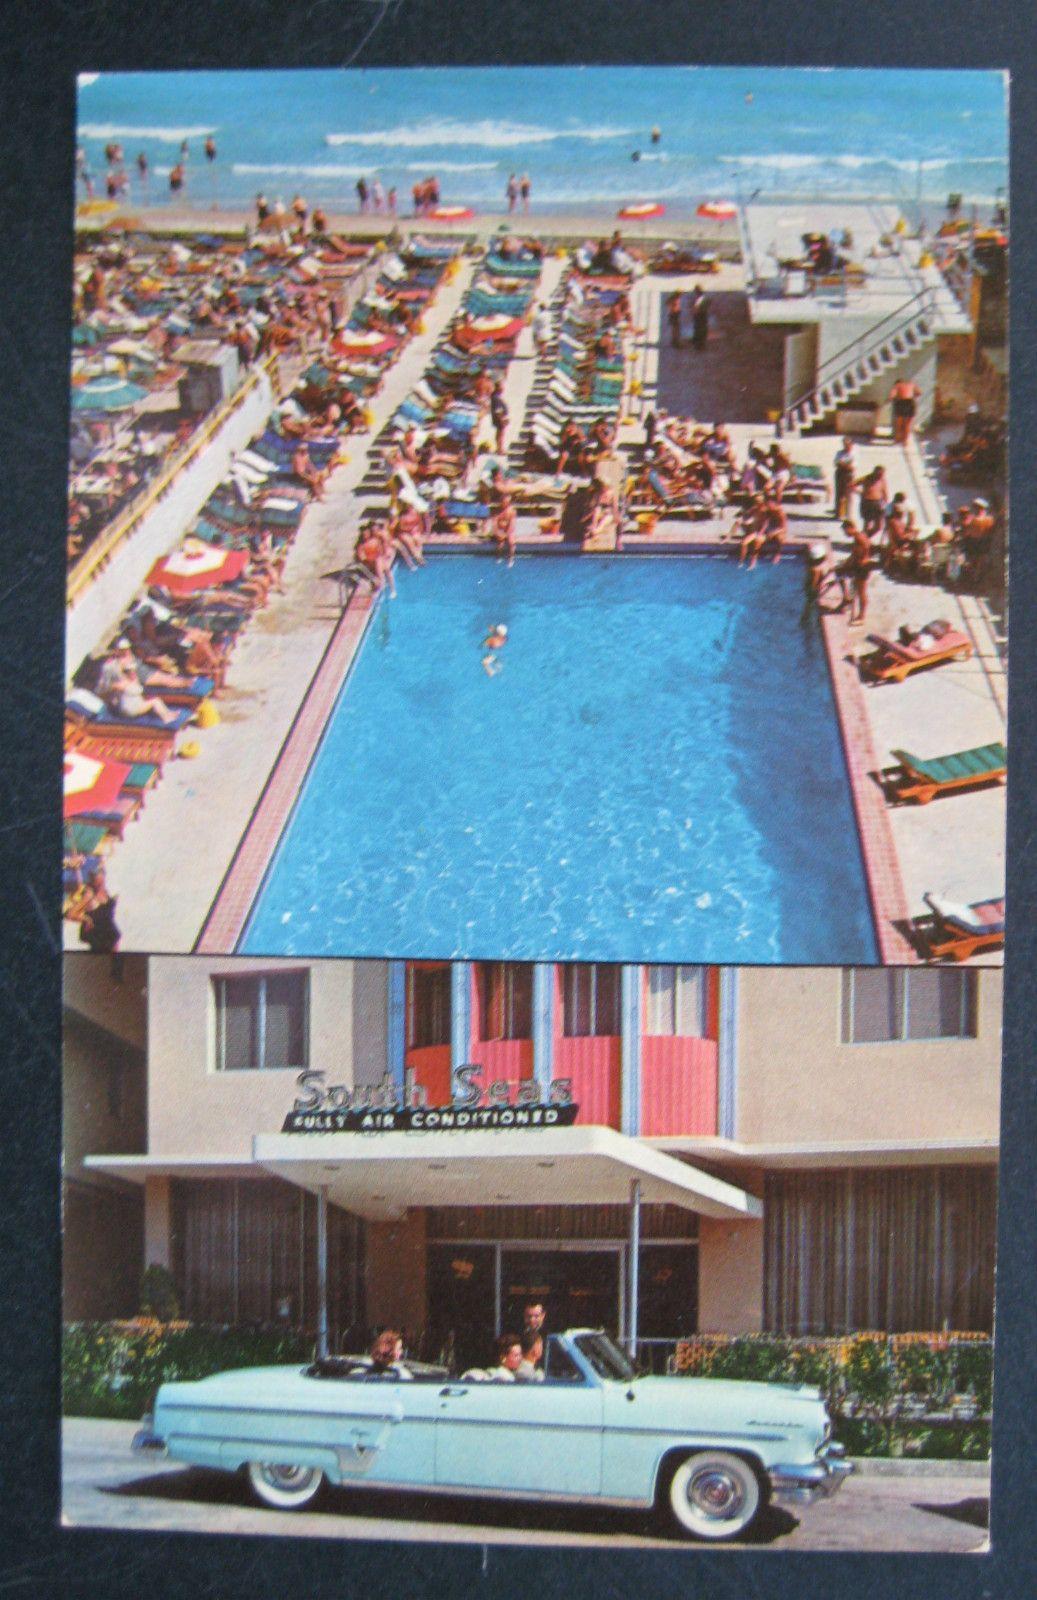 FL Miami Beach South Seas Hotel Swimming Pool Cabana Club